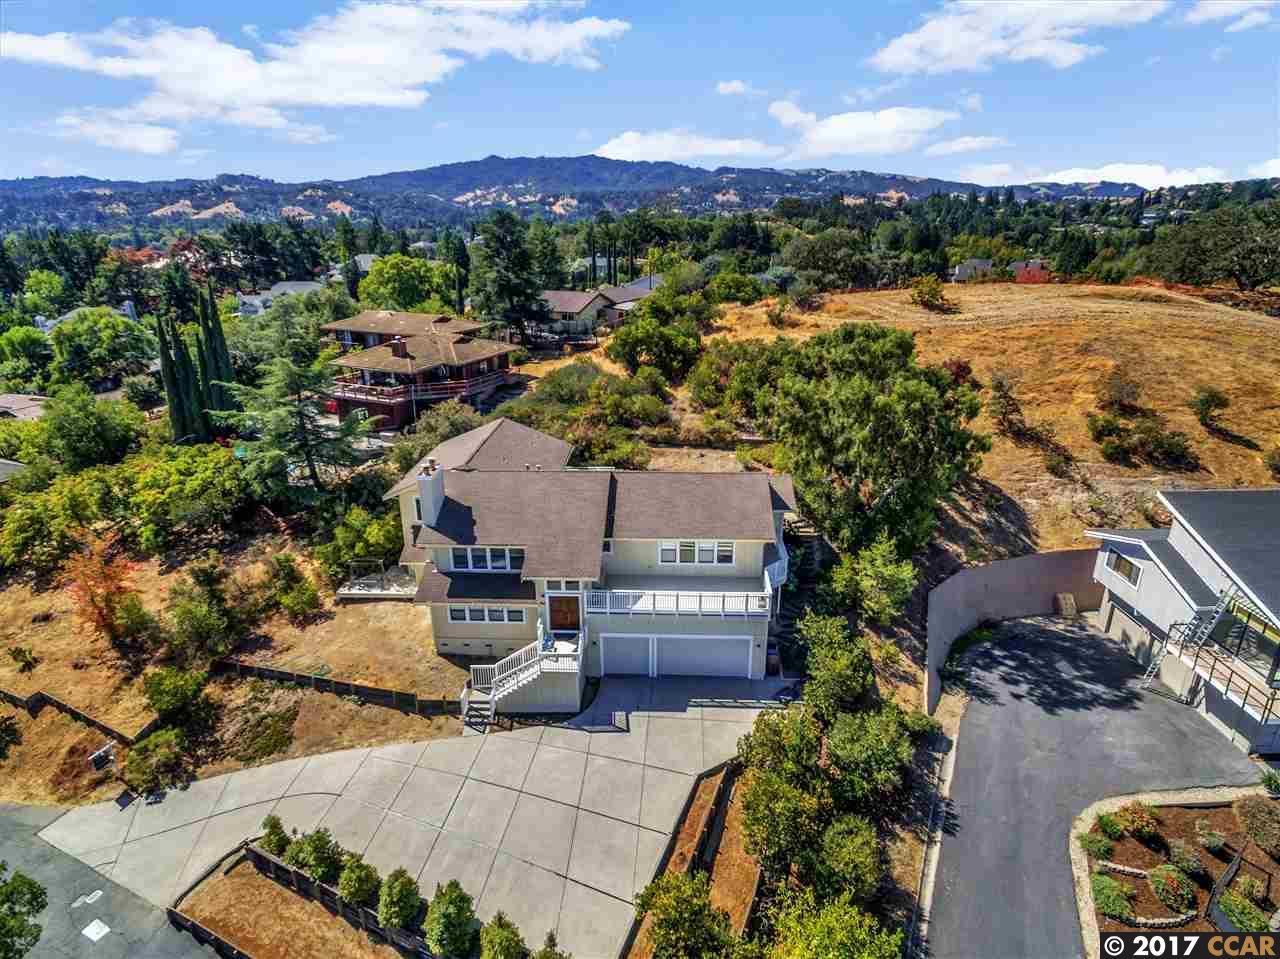 Single Family Home for Sale at 505 Camino Las Juntas 505 Camino Las Juntas Pleasant Hill, California 94523 United States